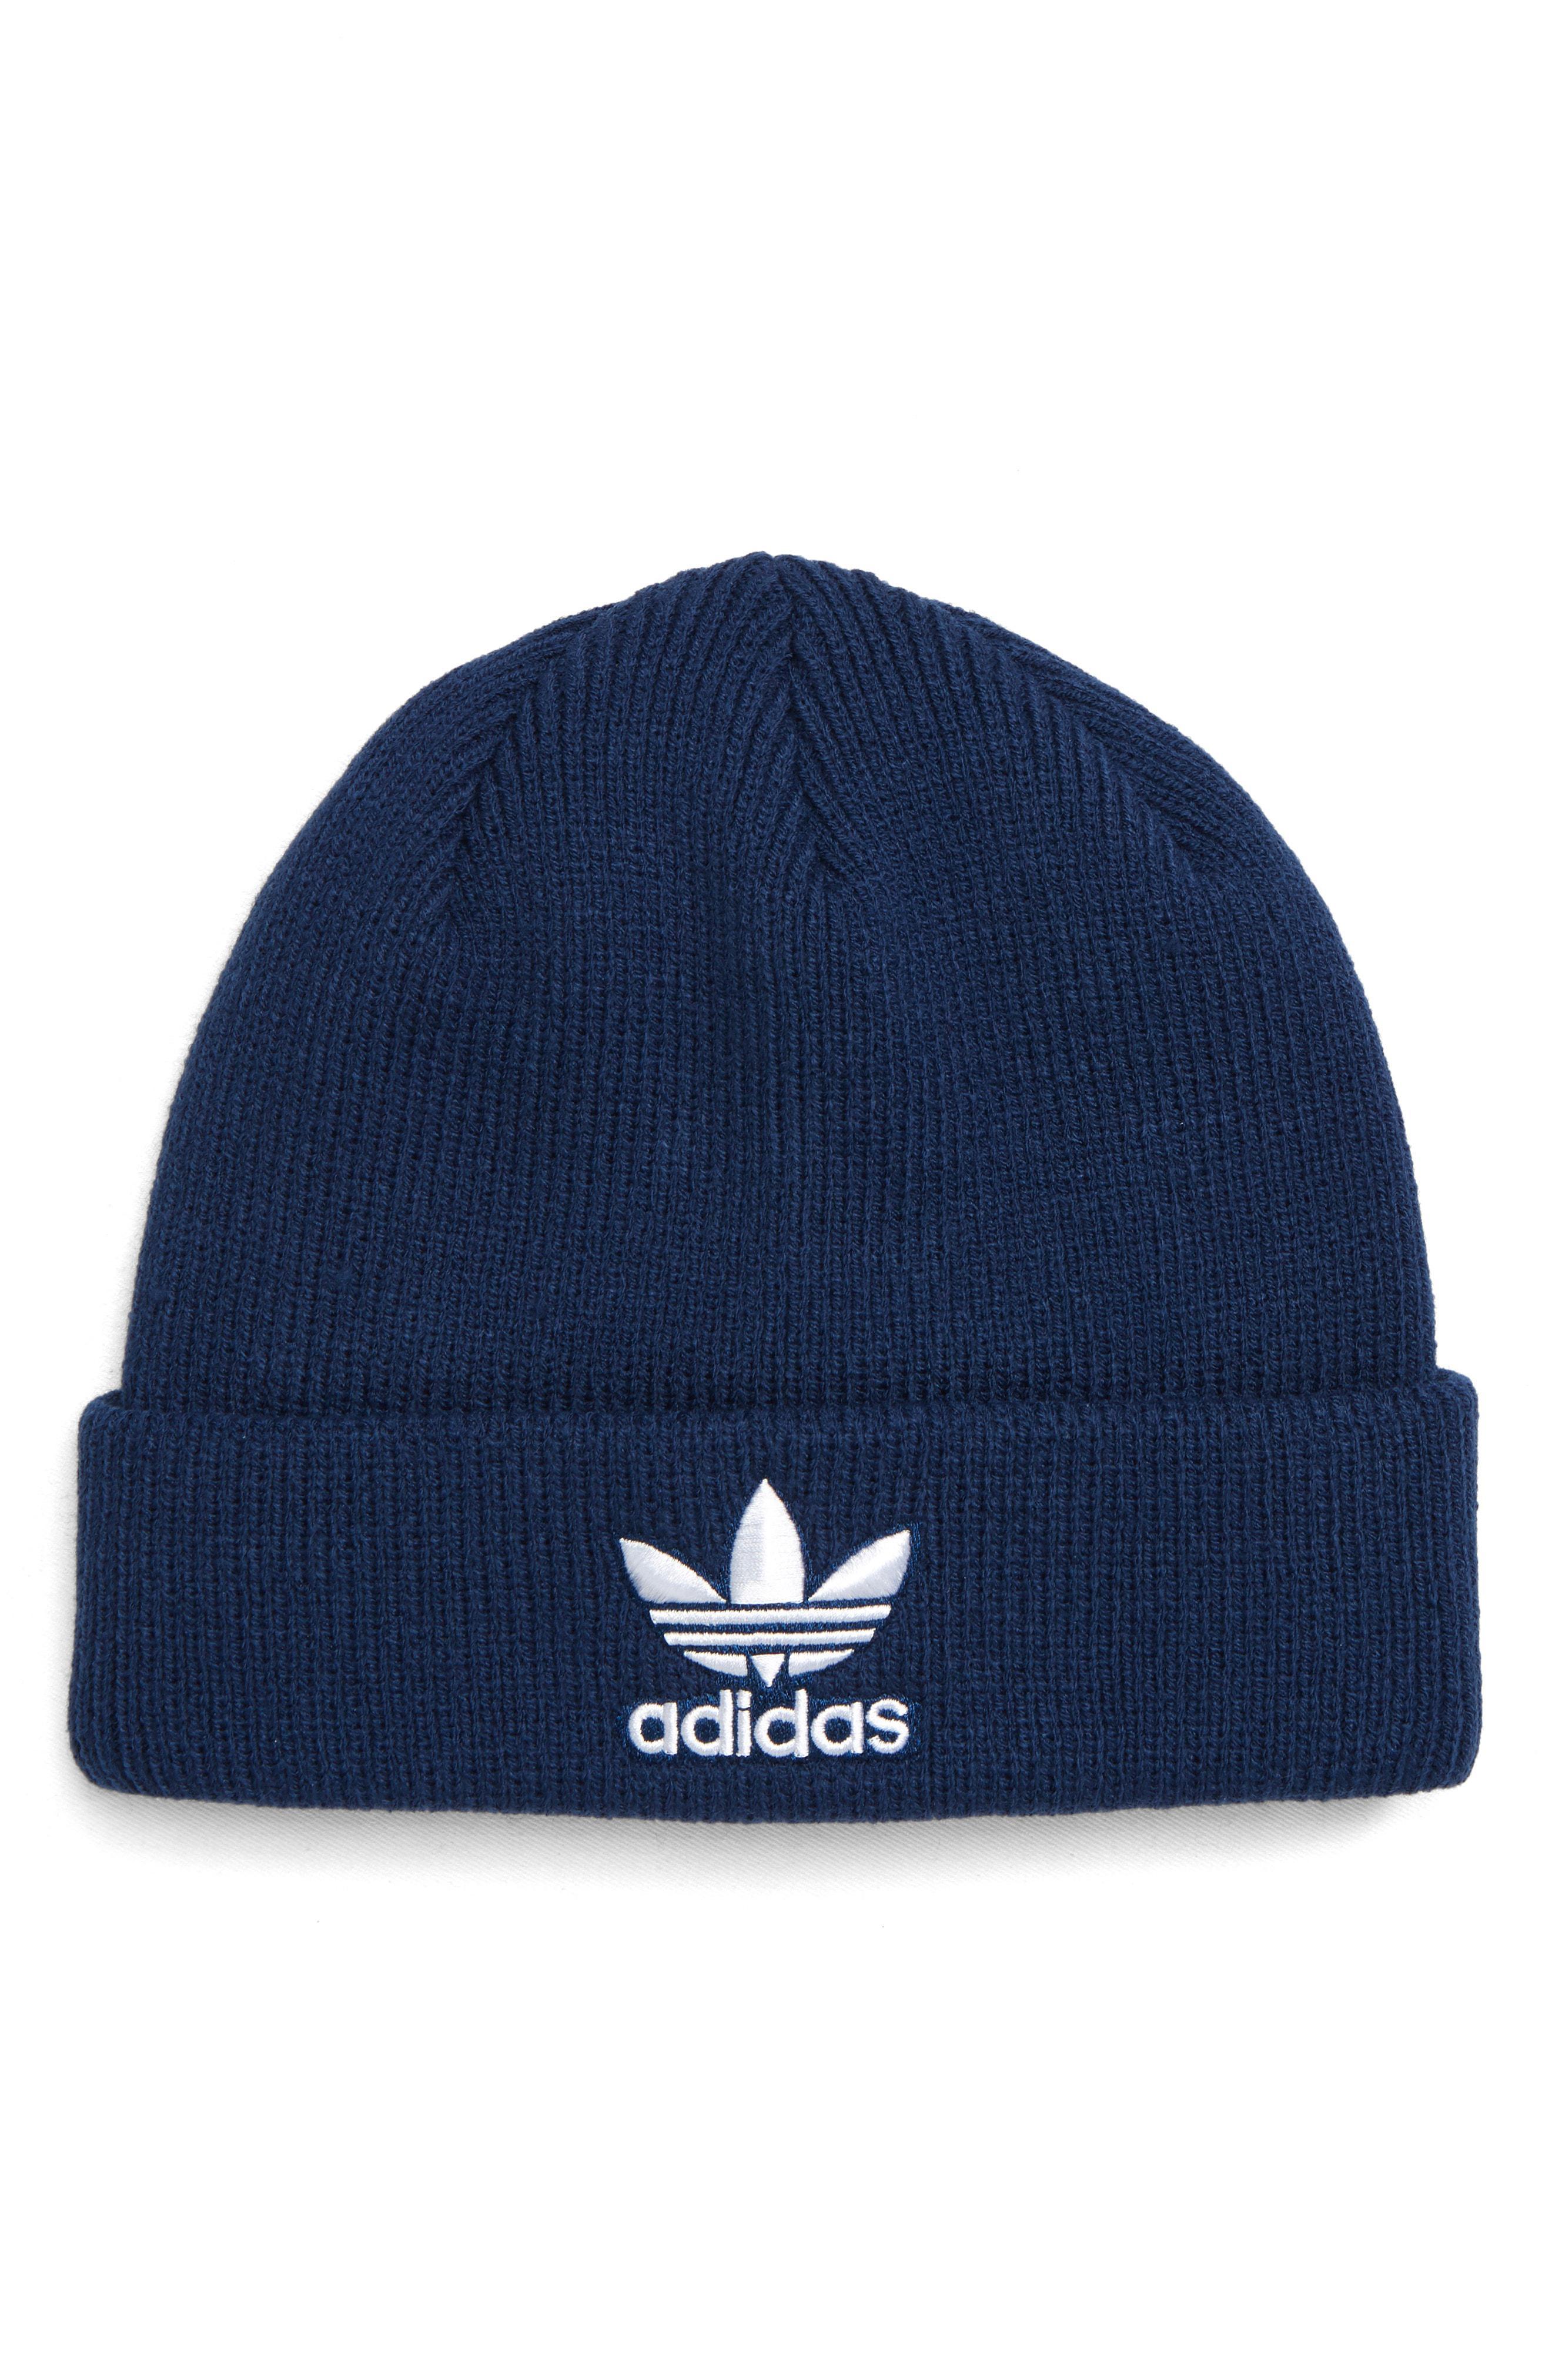 a6901e1025d75 Lyst - Adidas Originals Trefoil Beanie - in Blue for Men